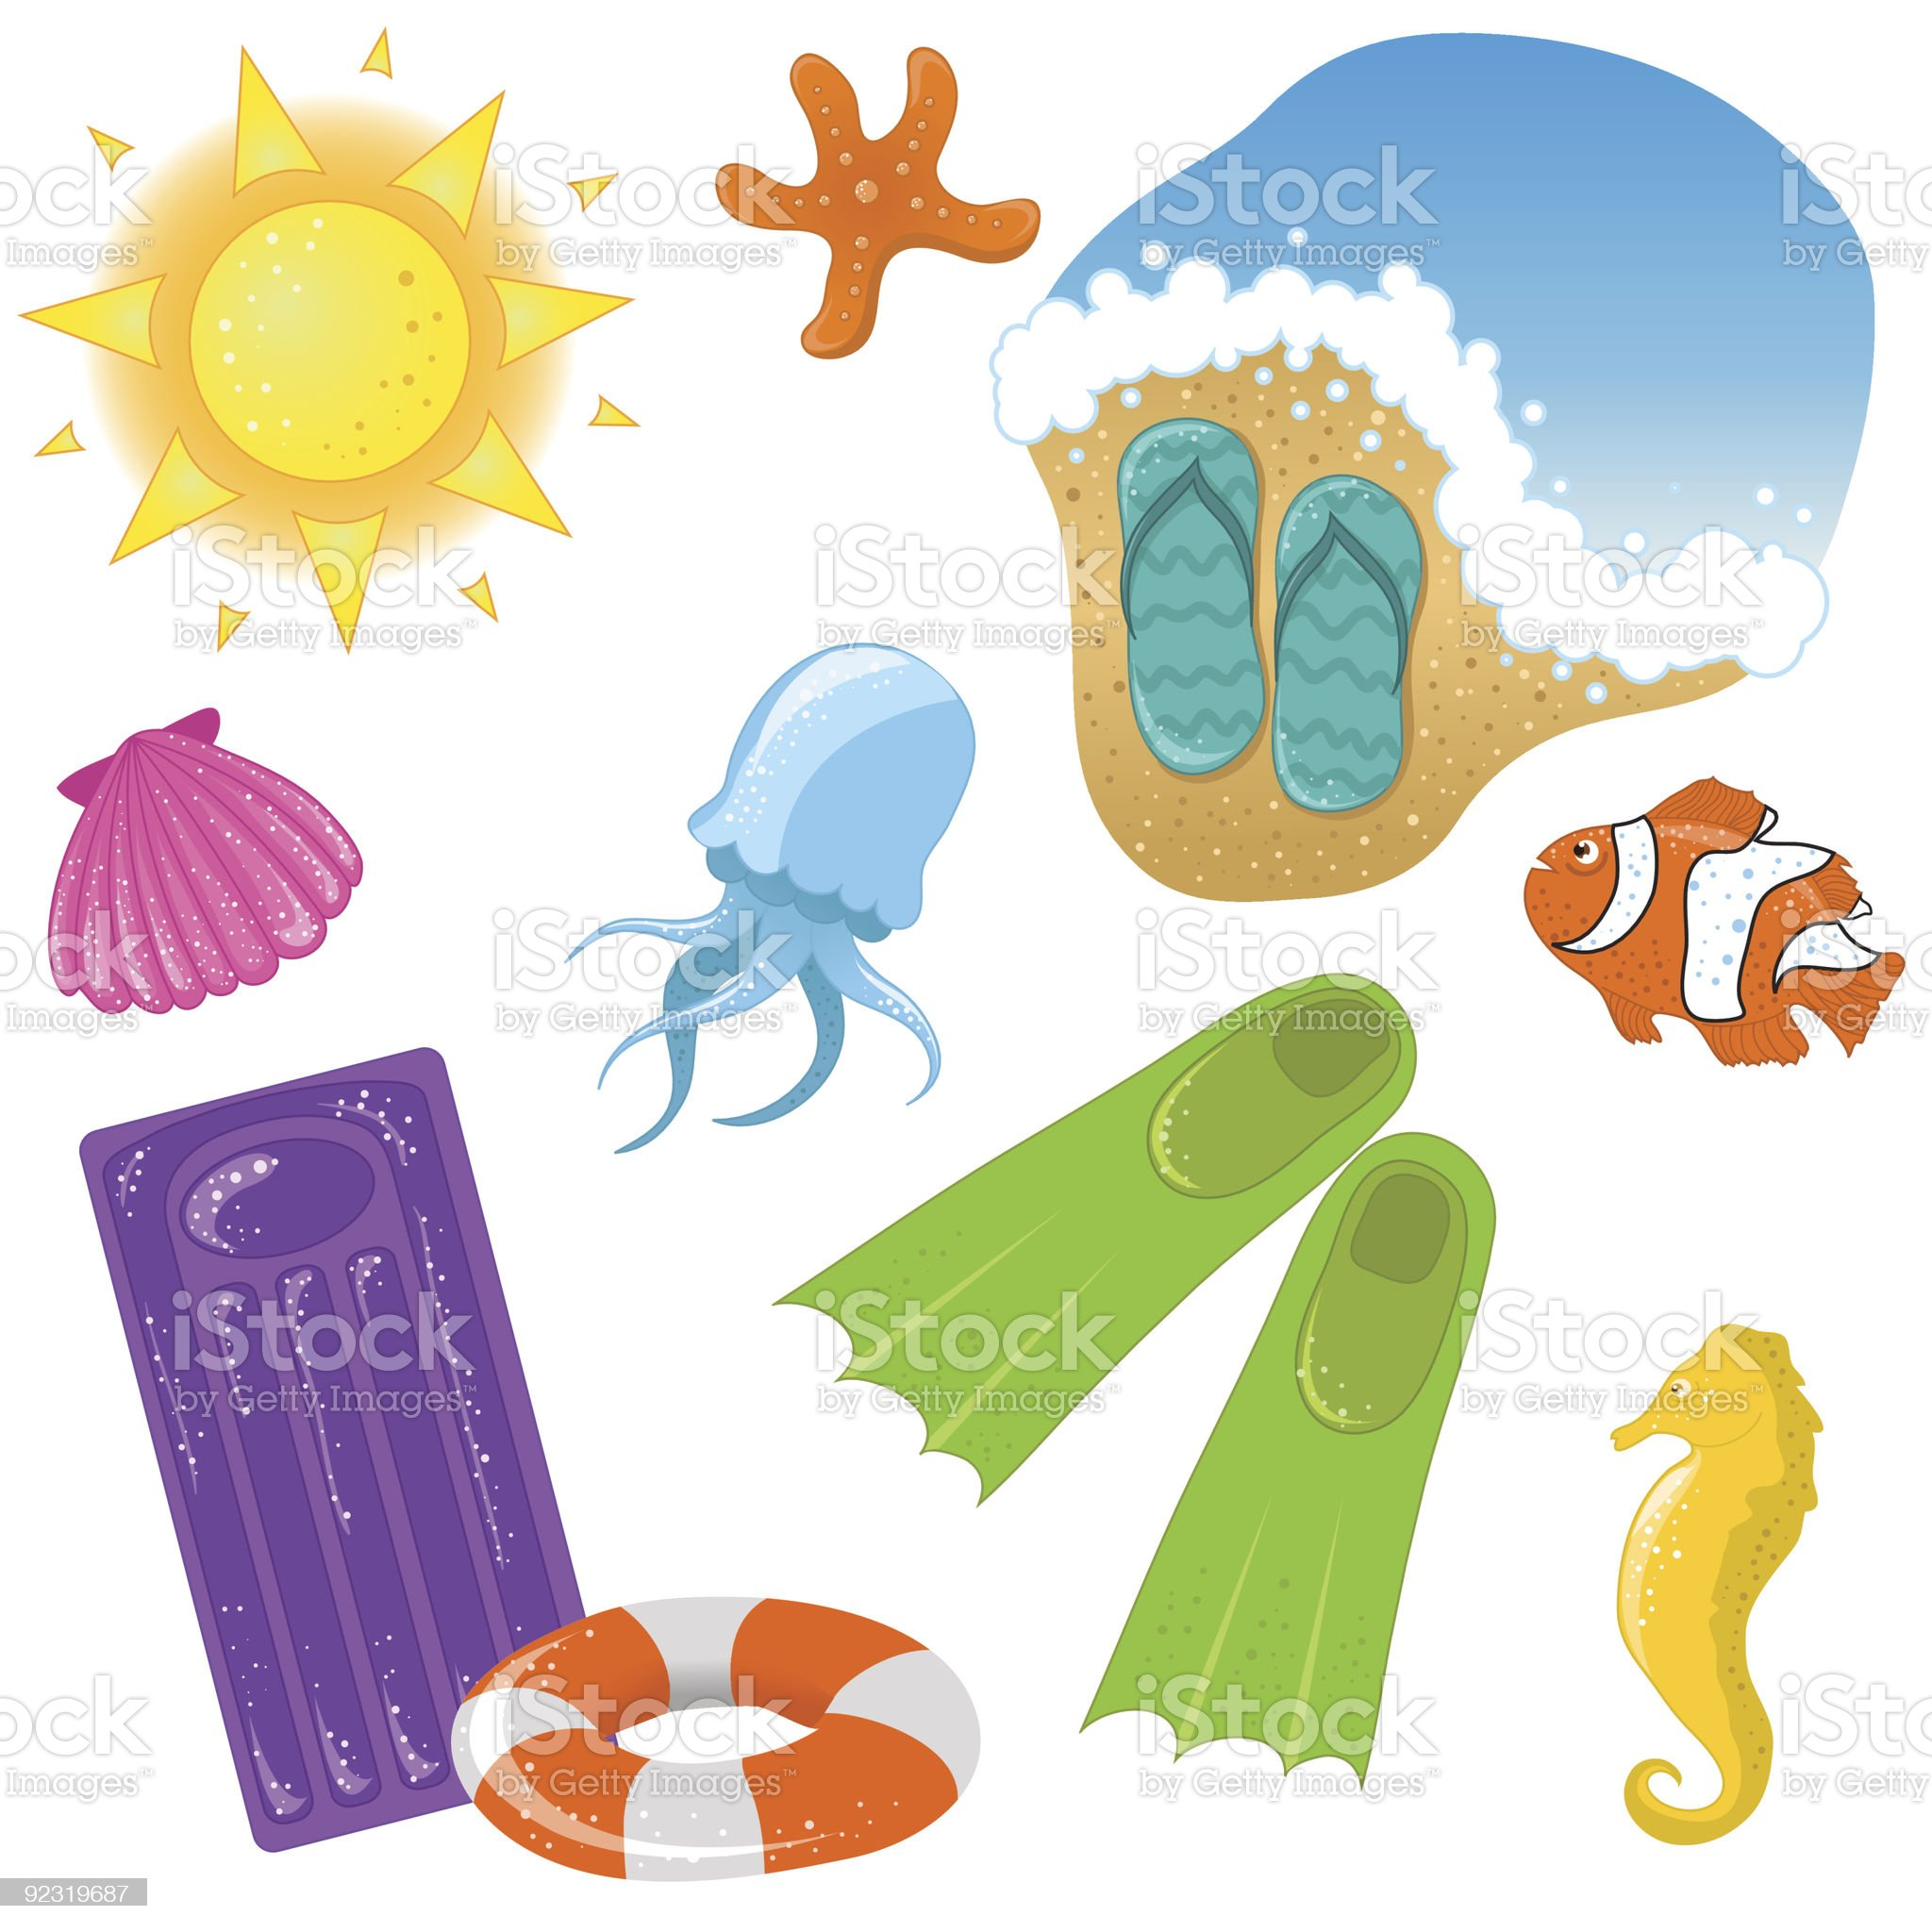 Vacation icons royalty-free stock vector art